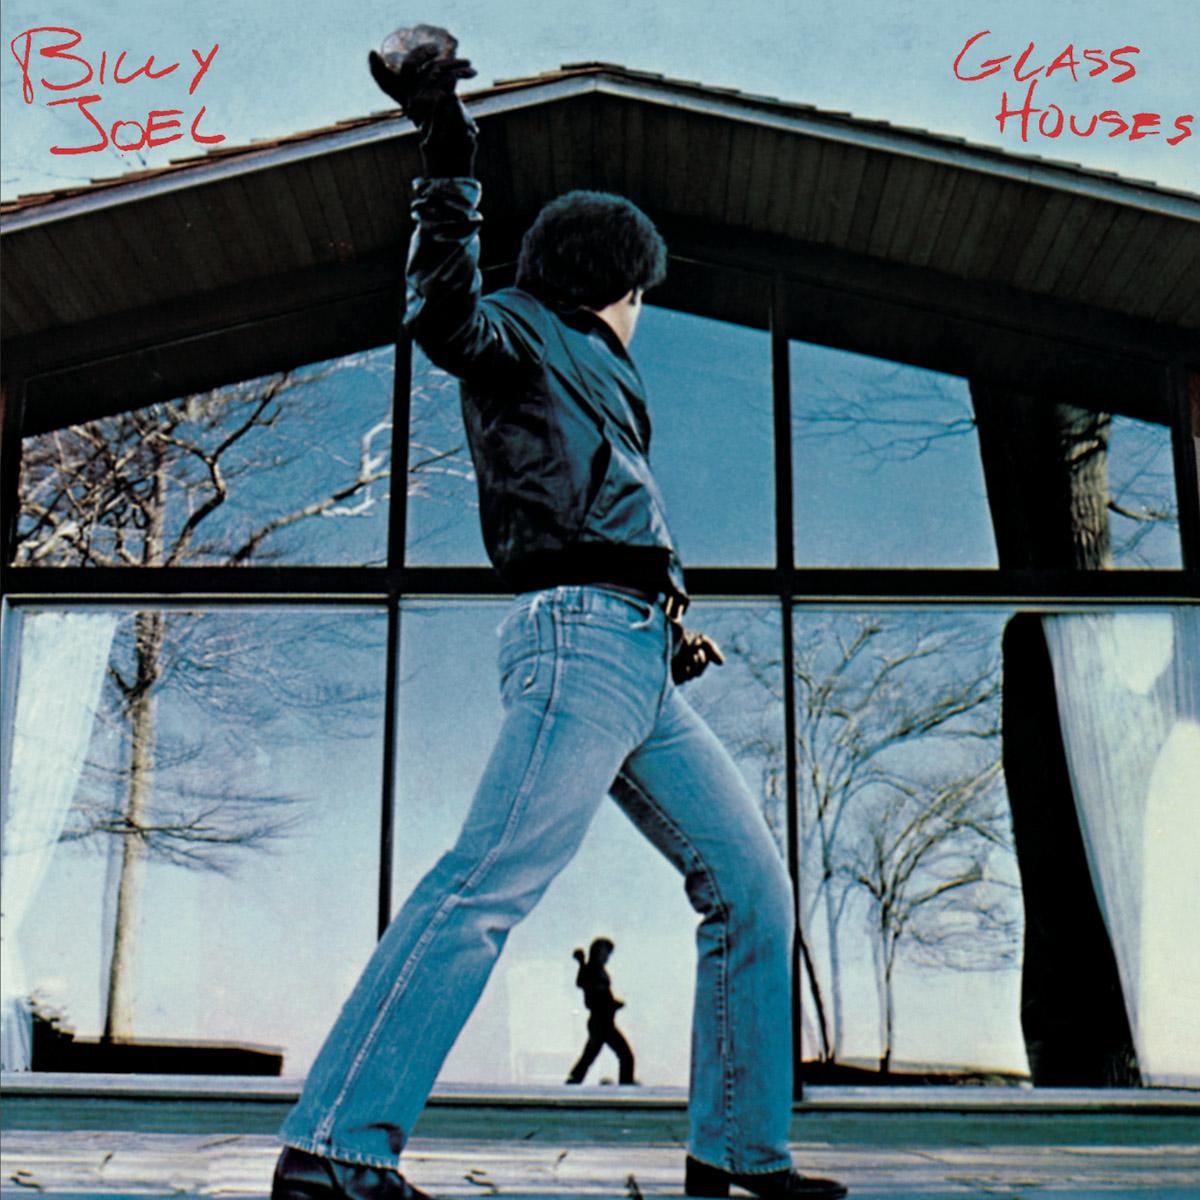 Billy Joel - Glass Houses